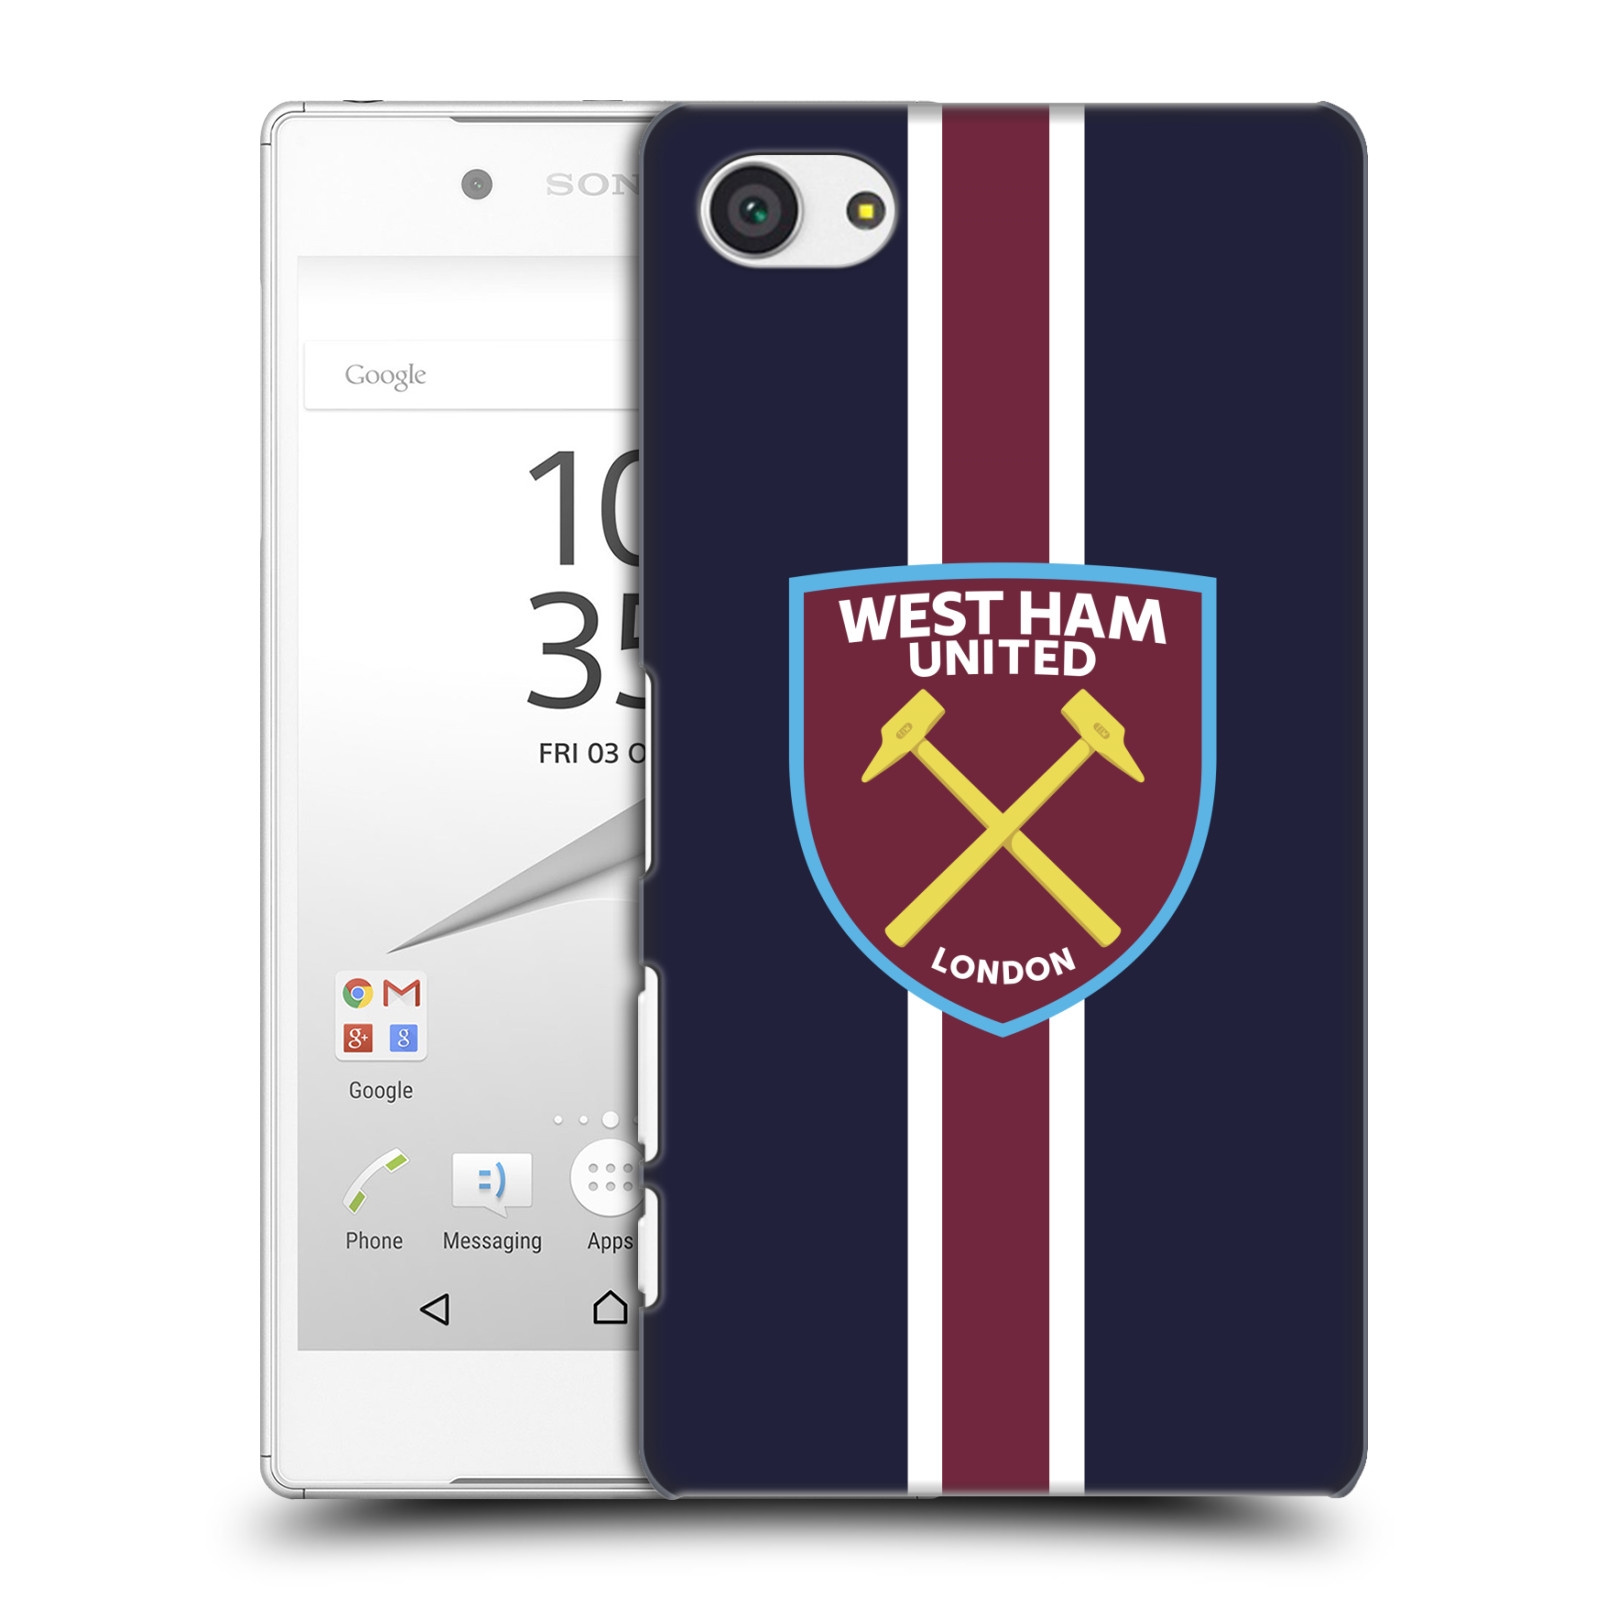 Plastové pouzdro na mobil Sony Xperia Z5 Compact - Head Case - West Ham United - Pruhy